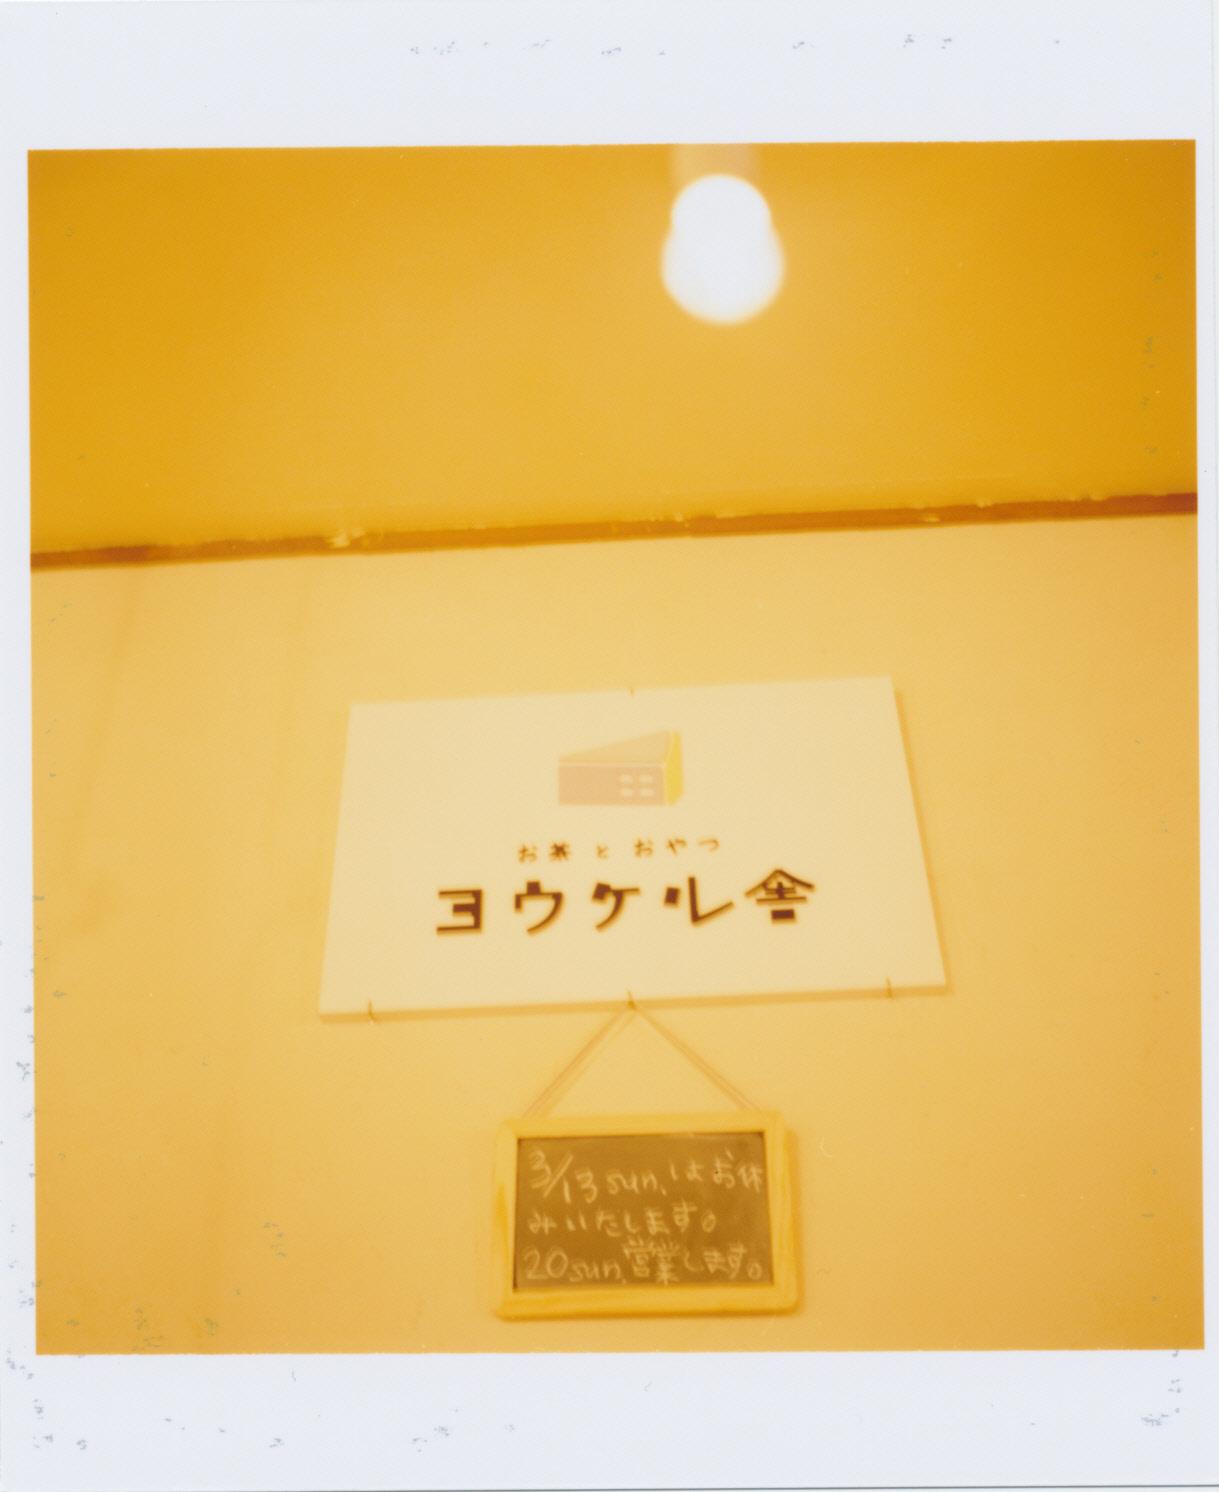 Kodak_PORTRA_400_0014